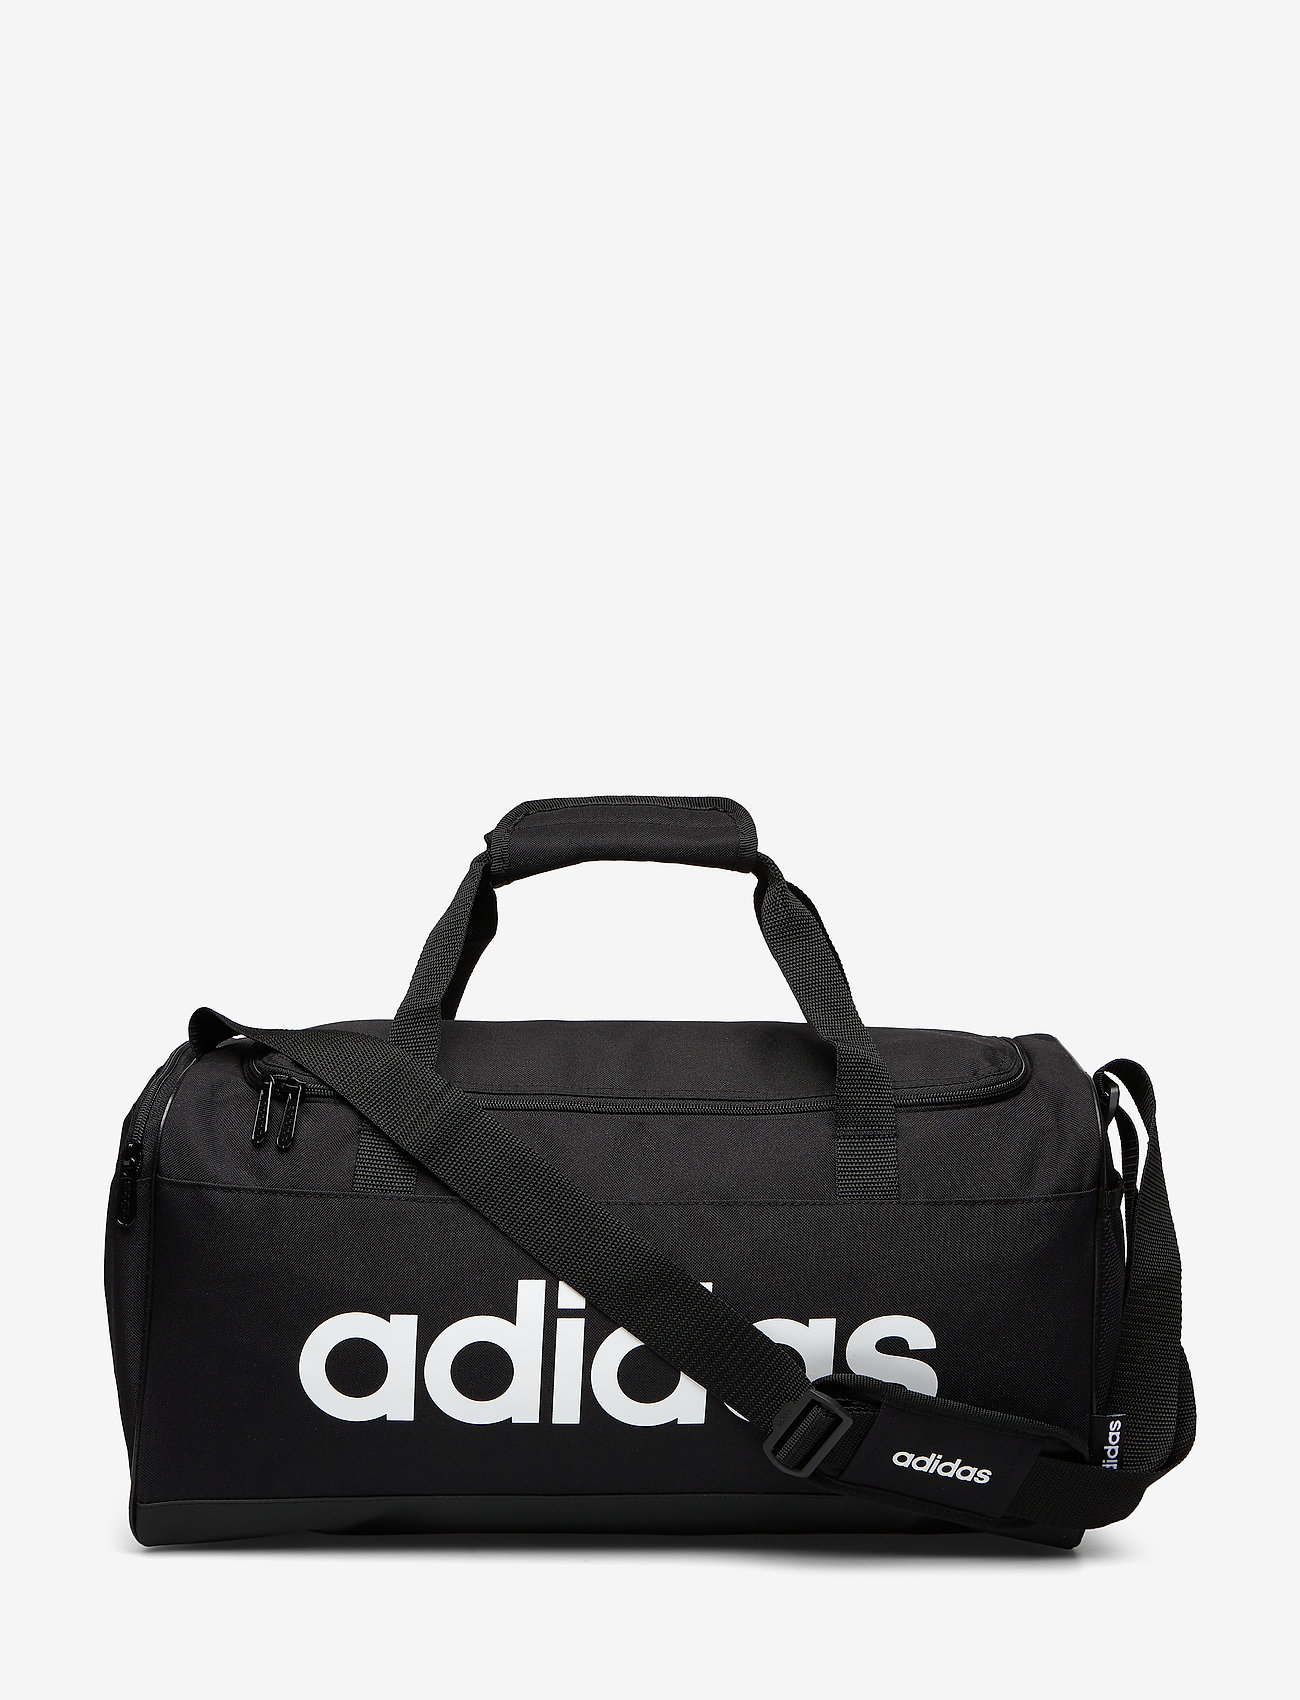 adidas Performance - LIN DUFFLE S - sports bags - black/black/white - 0